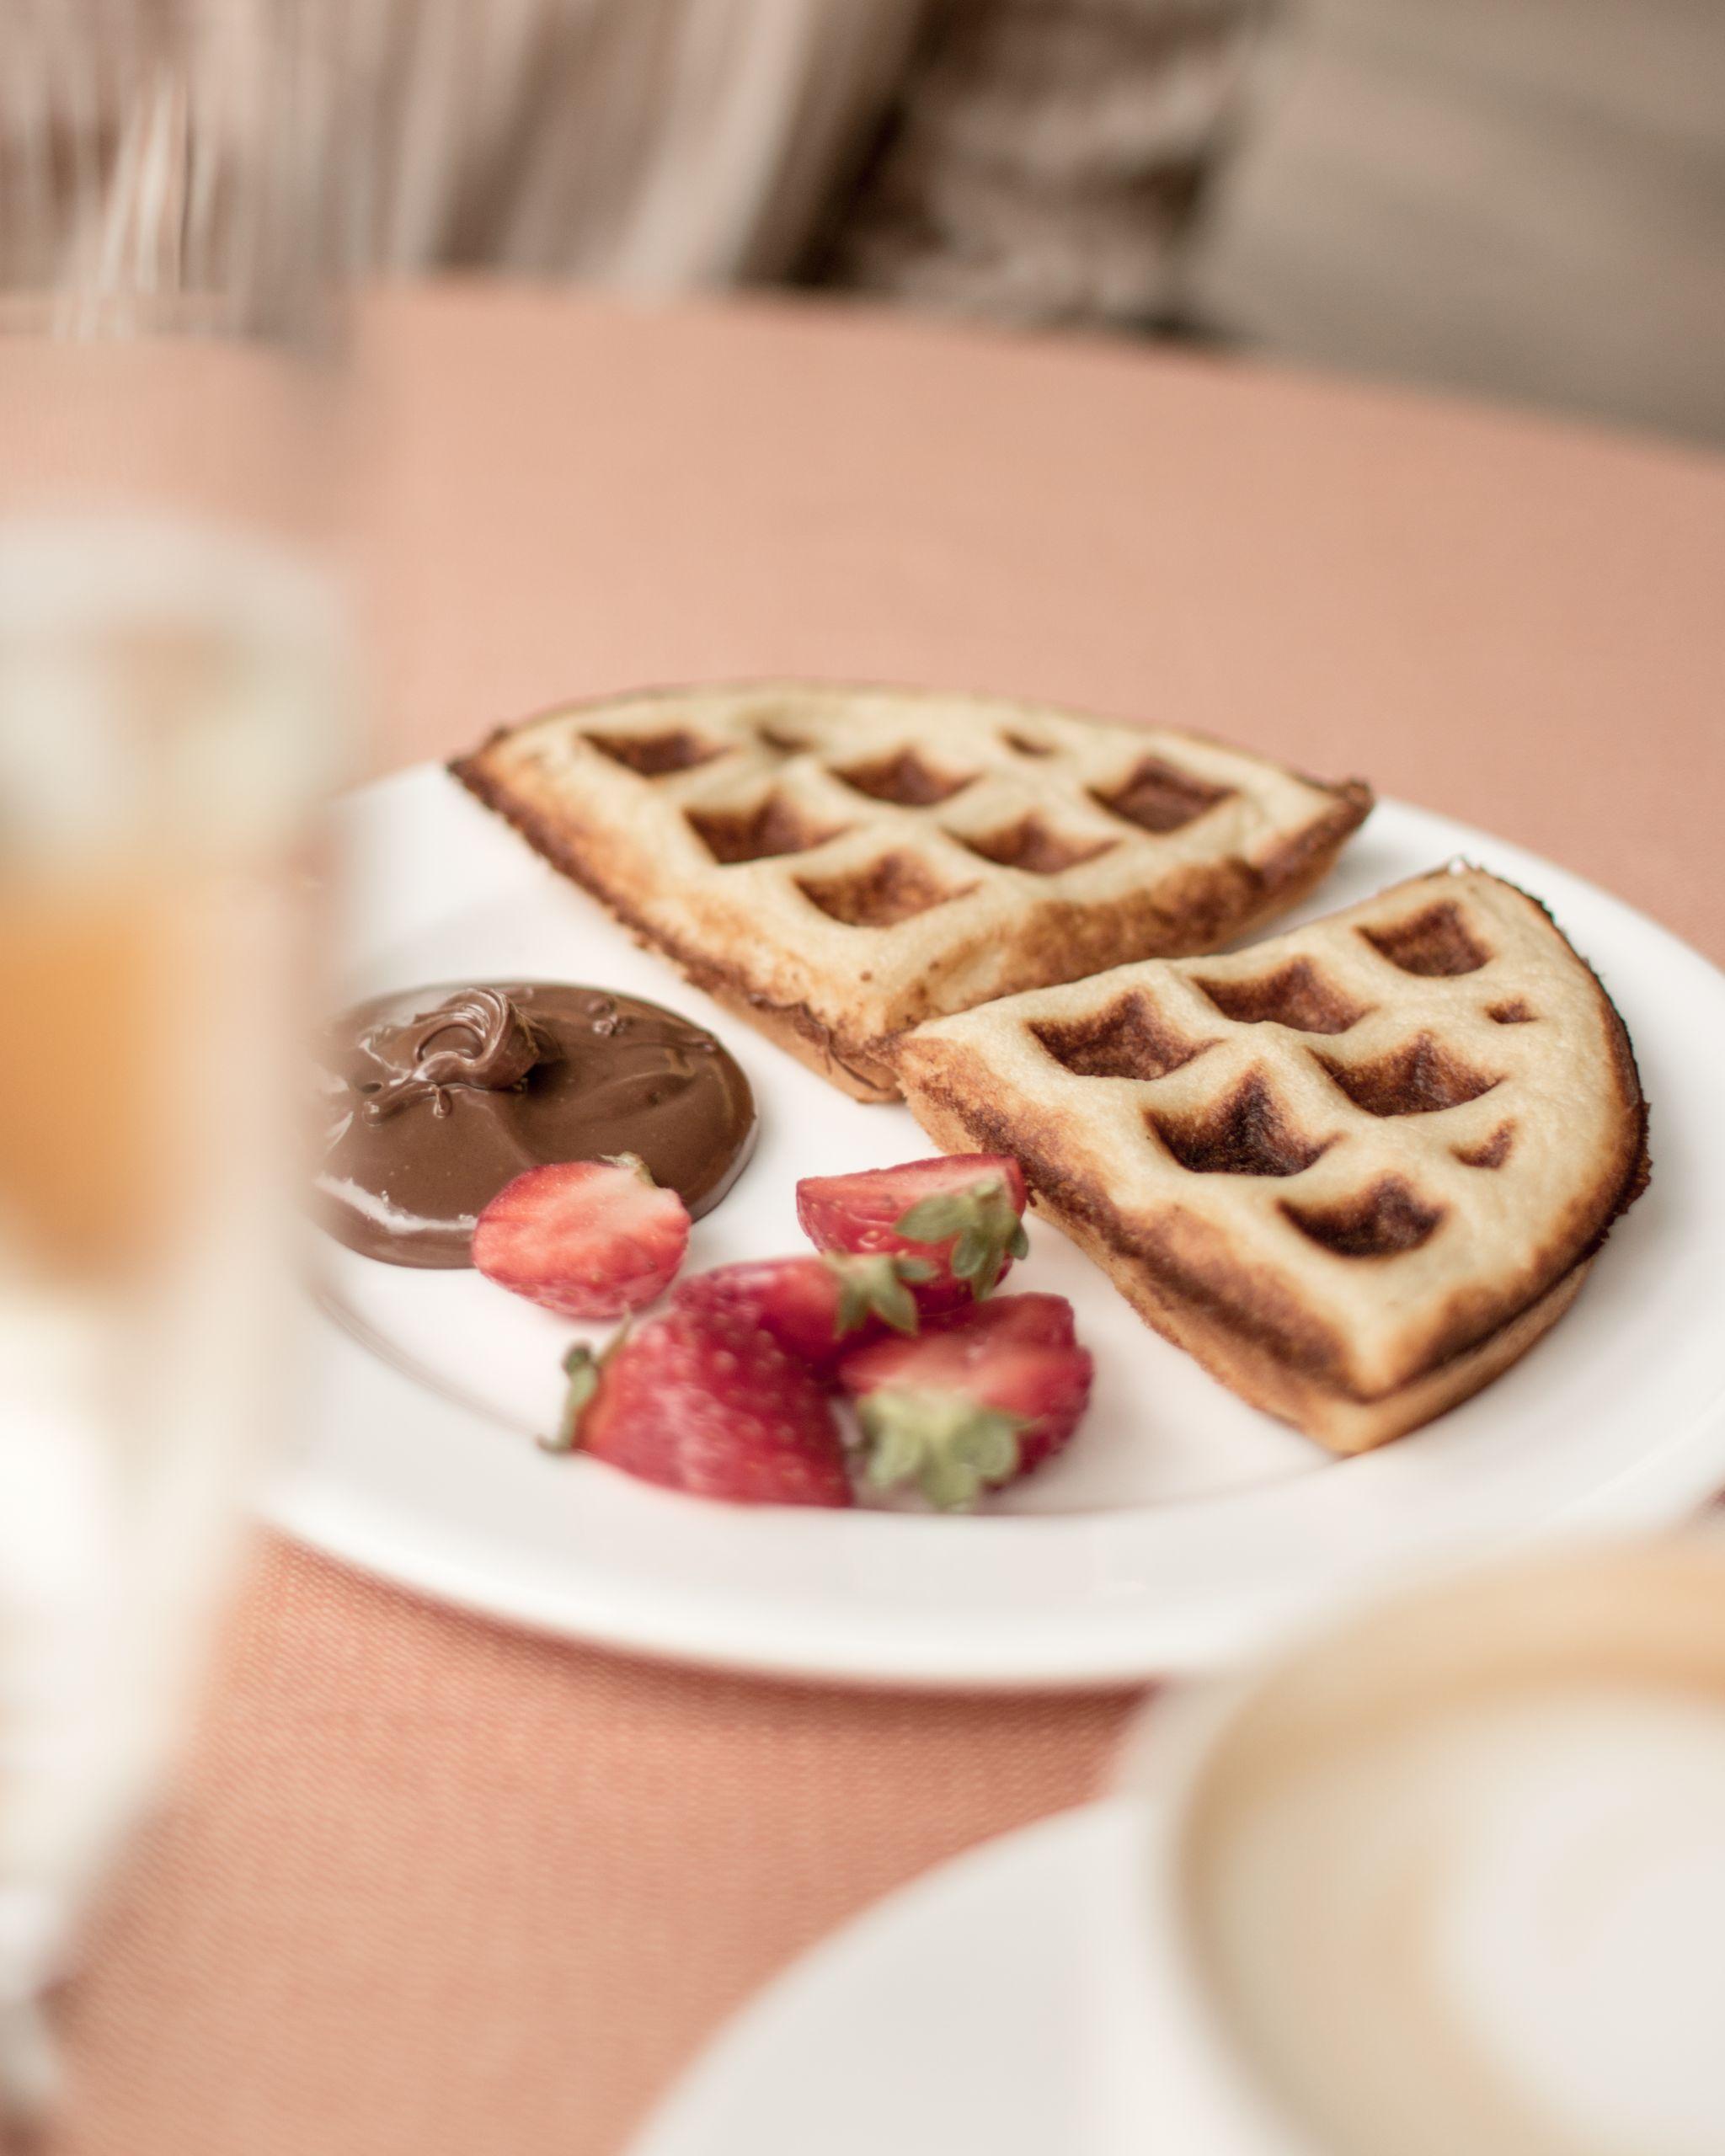 Adler Dolomites Hotel Ortisei Italy Hotel Hospitality Brand Photography Italian Breakfast Nutella Waffles